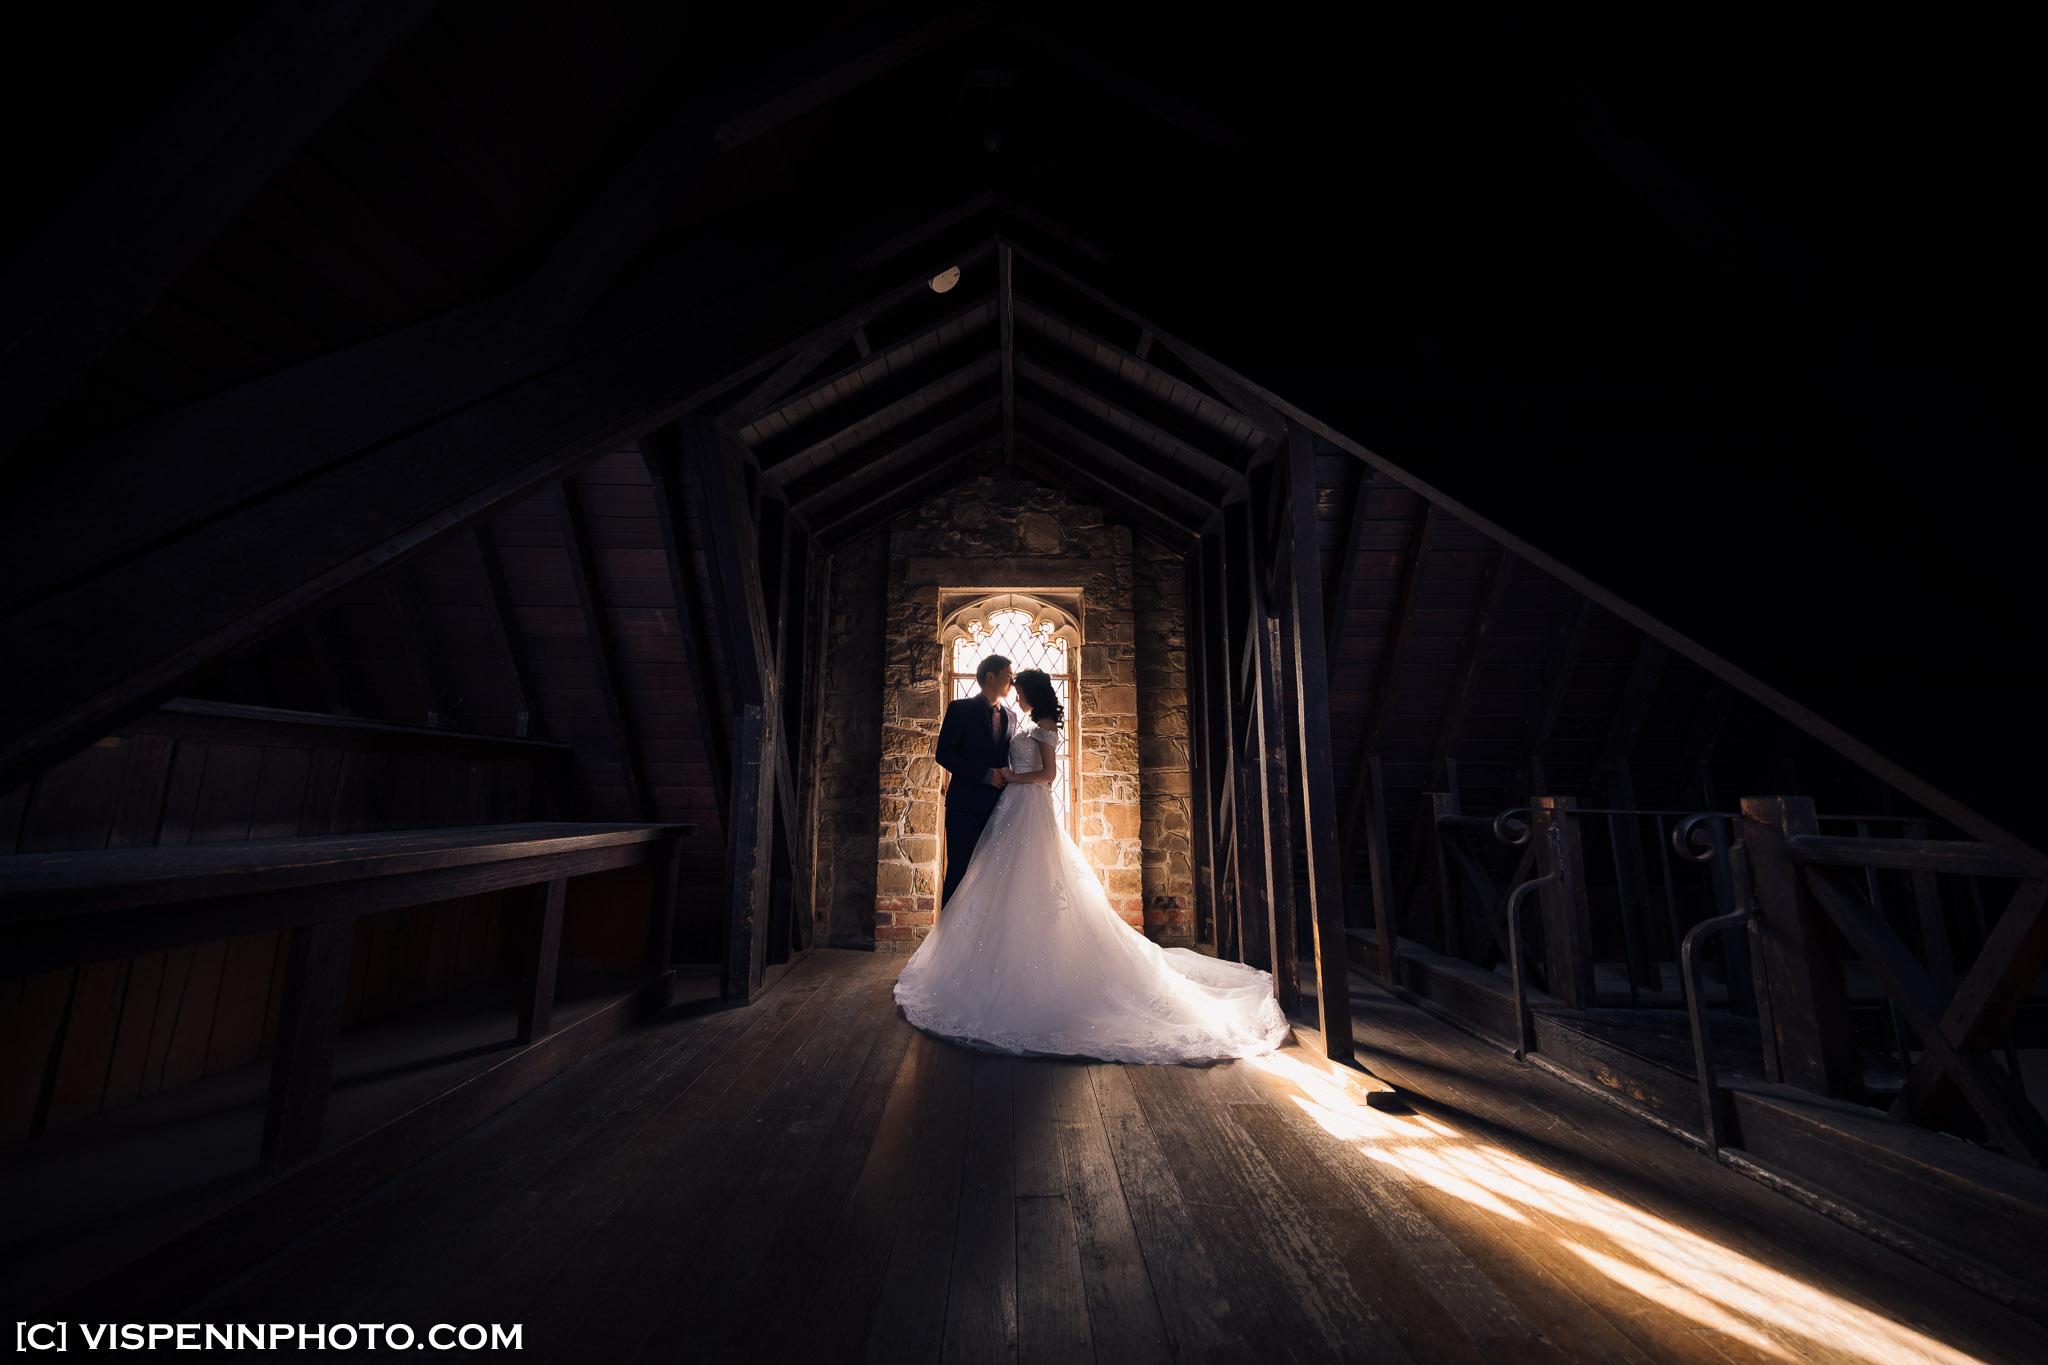 PRE WEDDING Photography Melbourne VISPENN 墨尔本 婚纱照 结婚照 婚纱摄影 VISPENN 5D4 0511